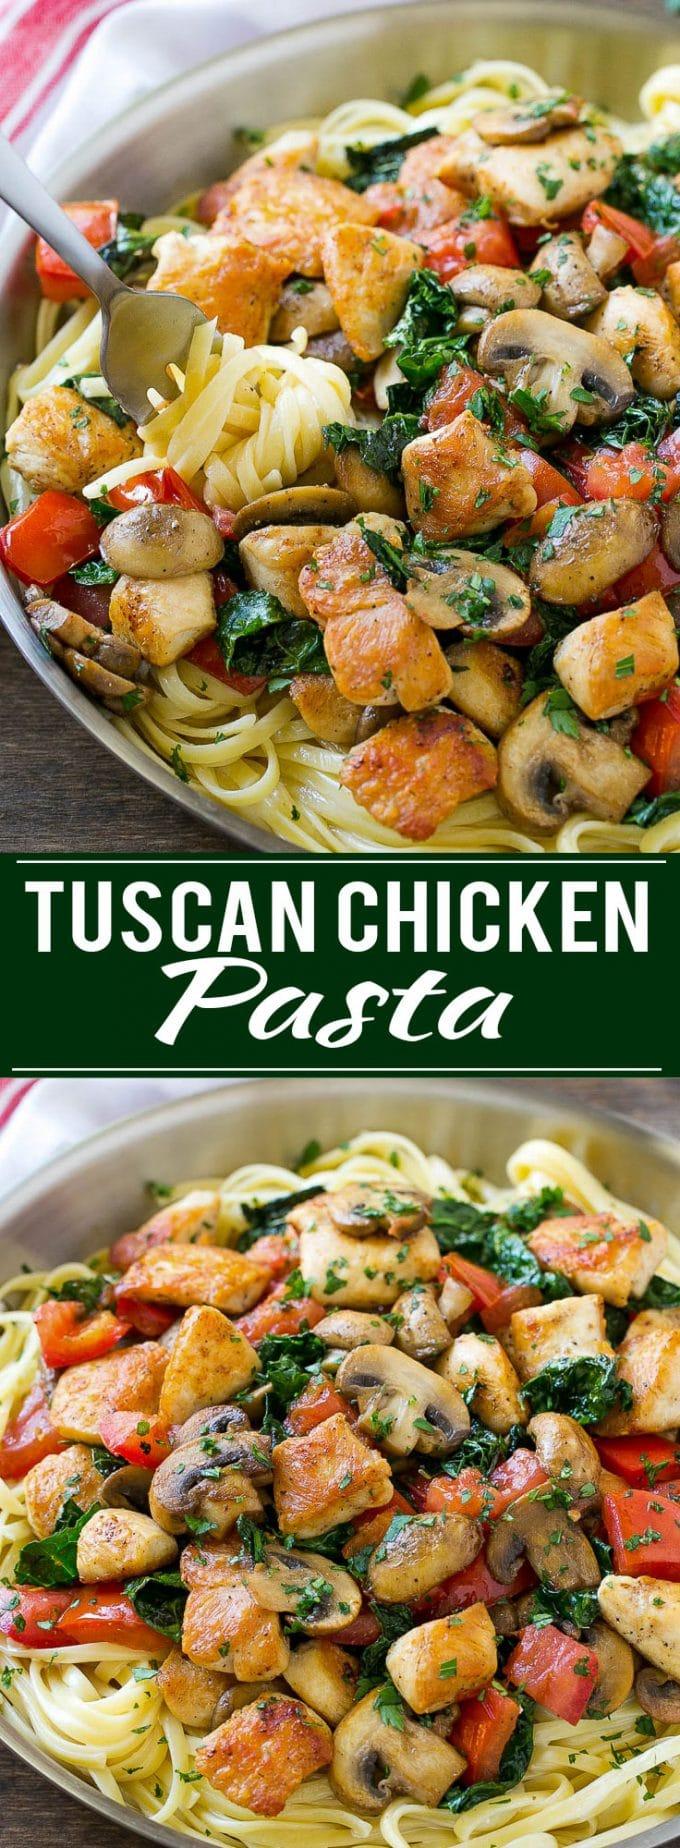 Tuscan Chicken Pasta Recipe | Creamy Chicken Pasta | Pasta Recipe | Easy Dinner Recipe